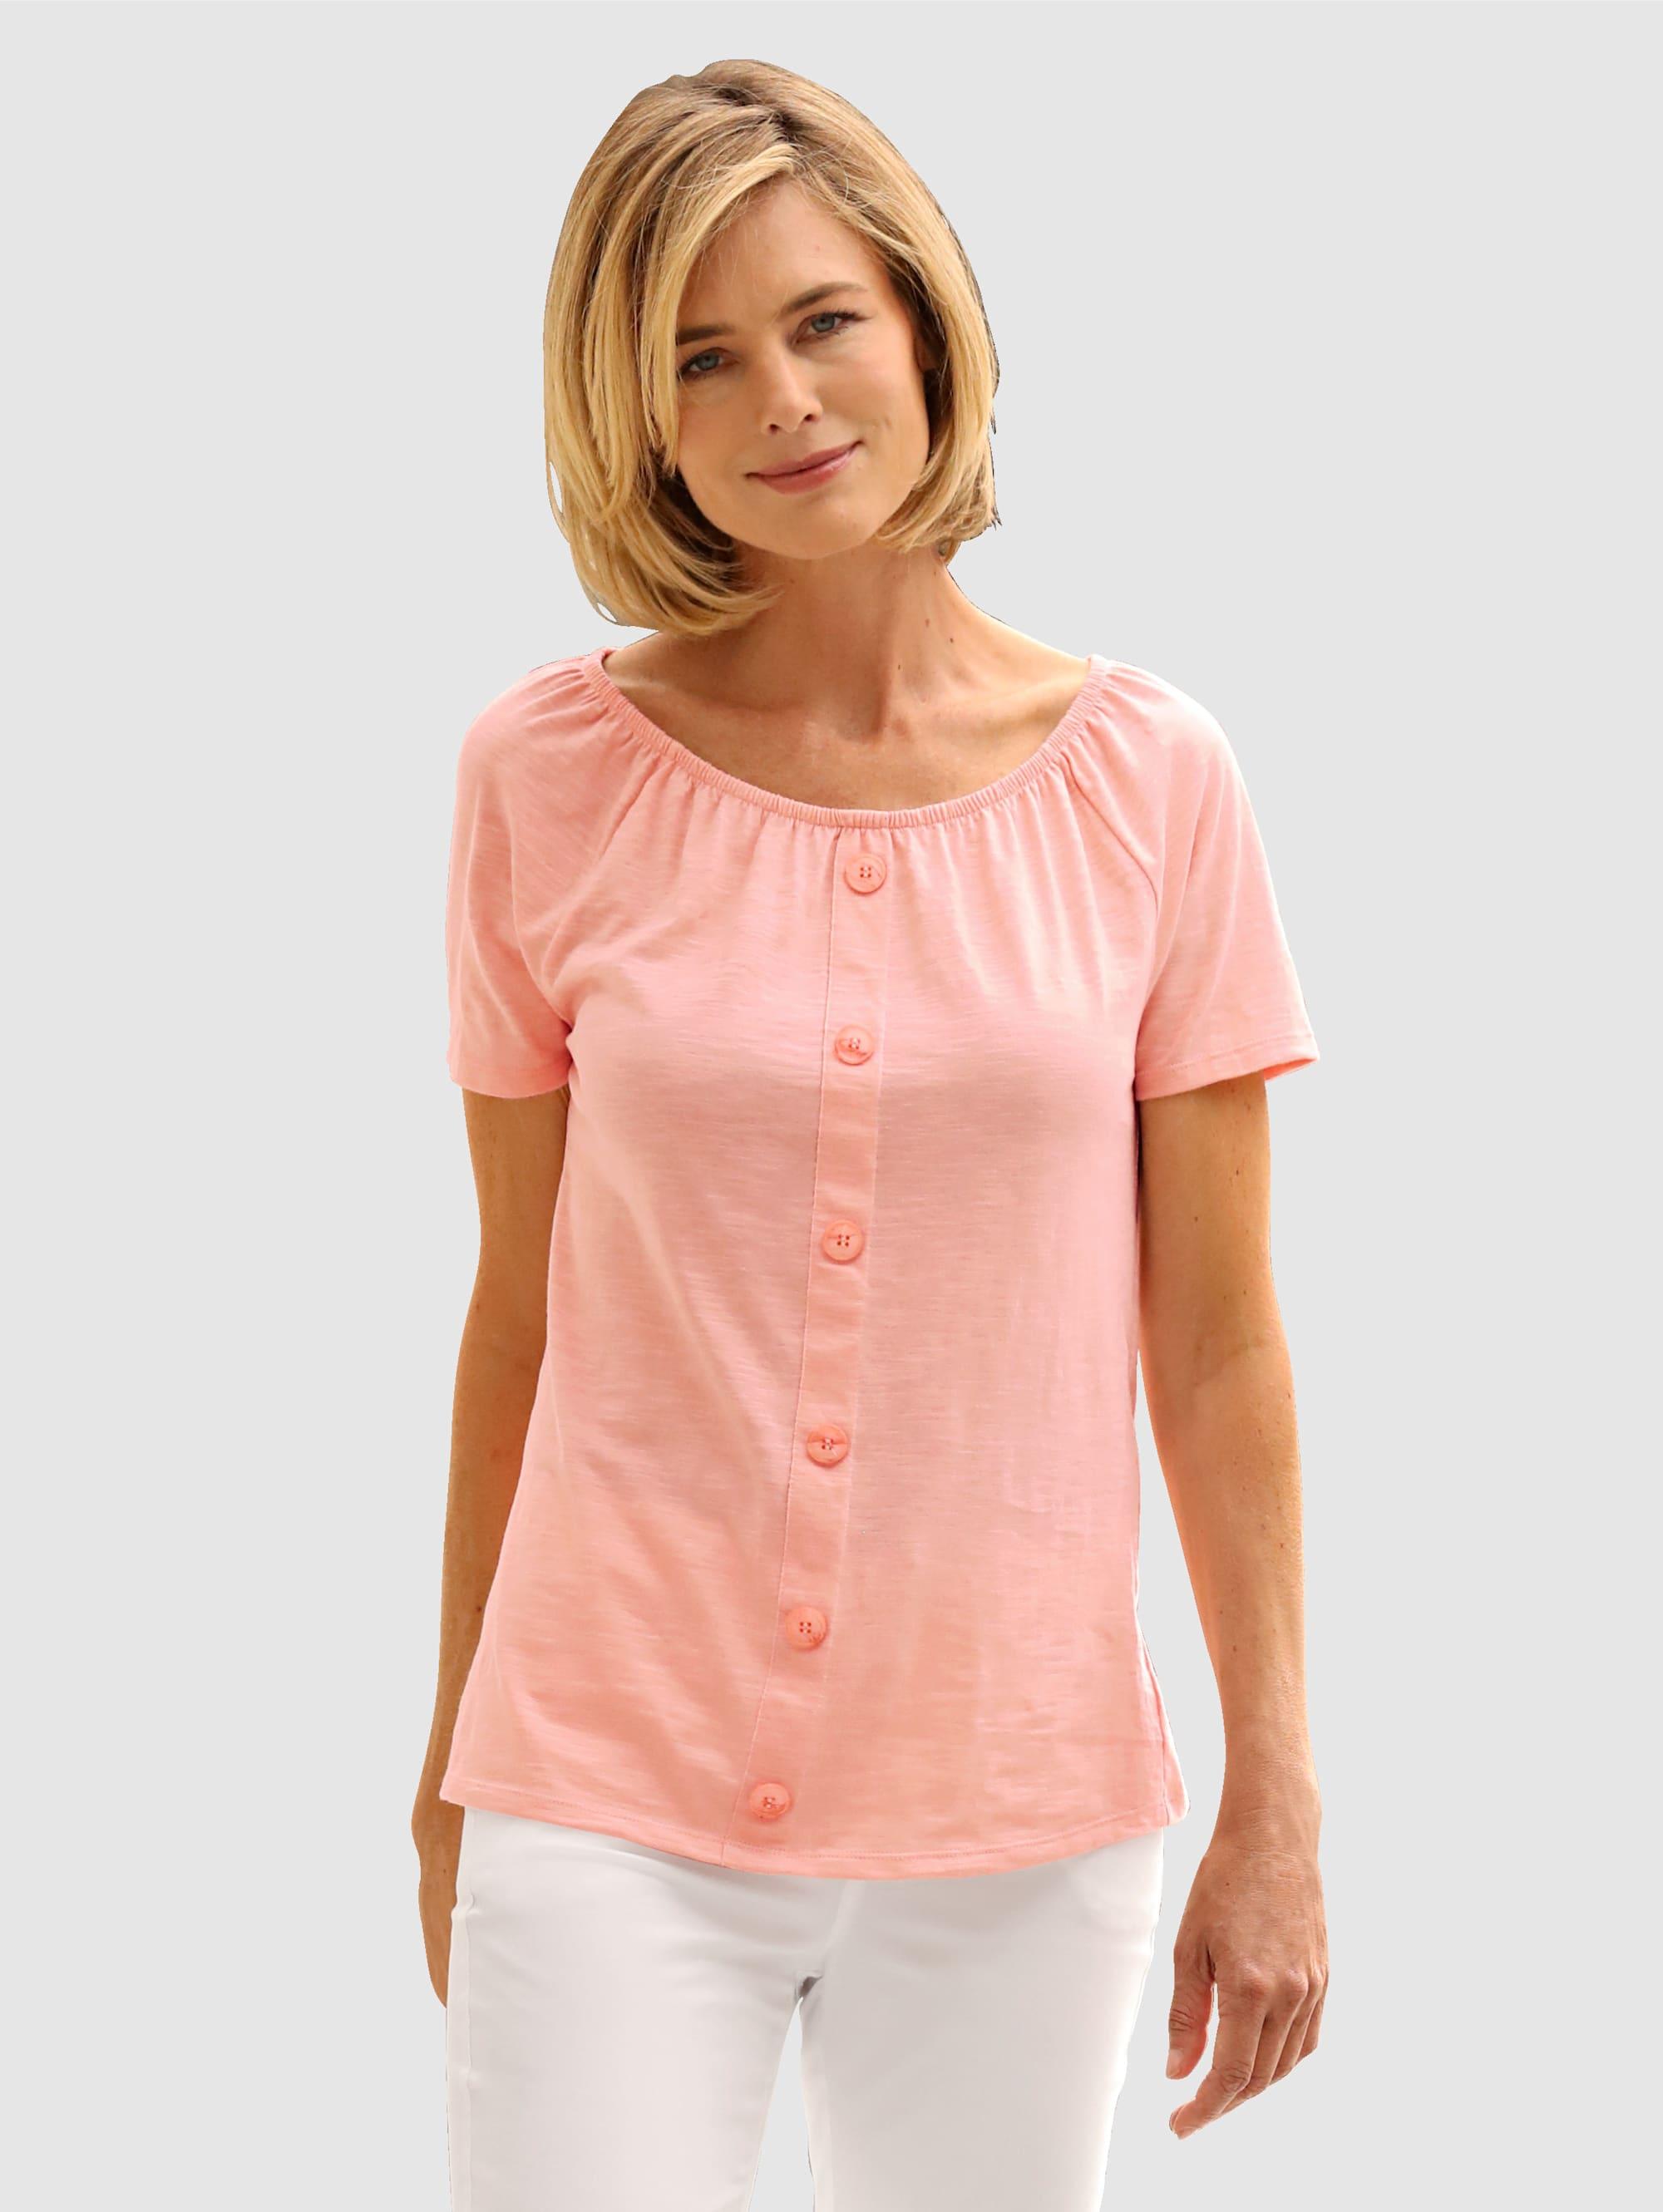 Dress In Shirt mit Carmenausschnitt hS5yW hVAXL